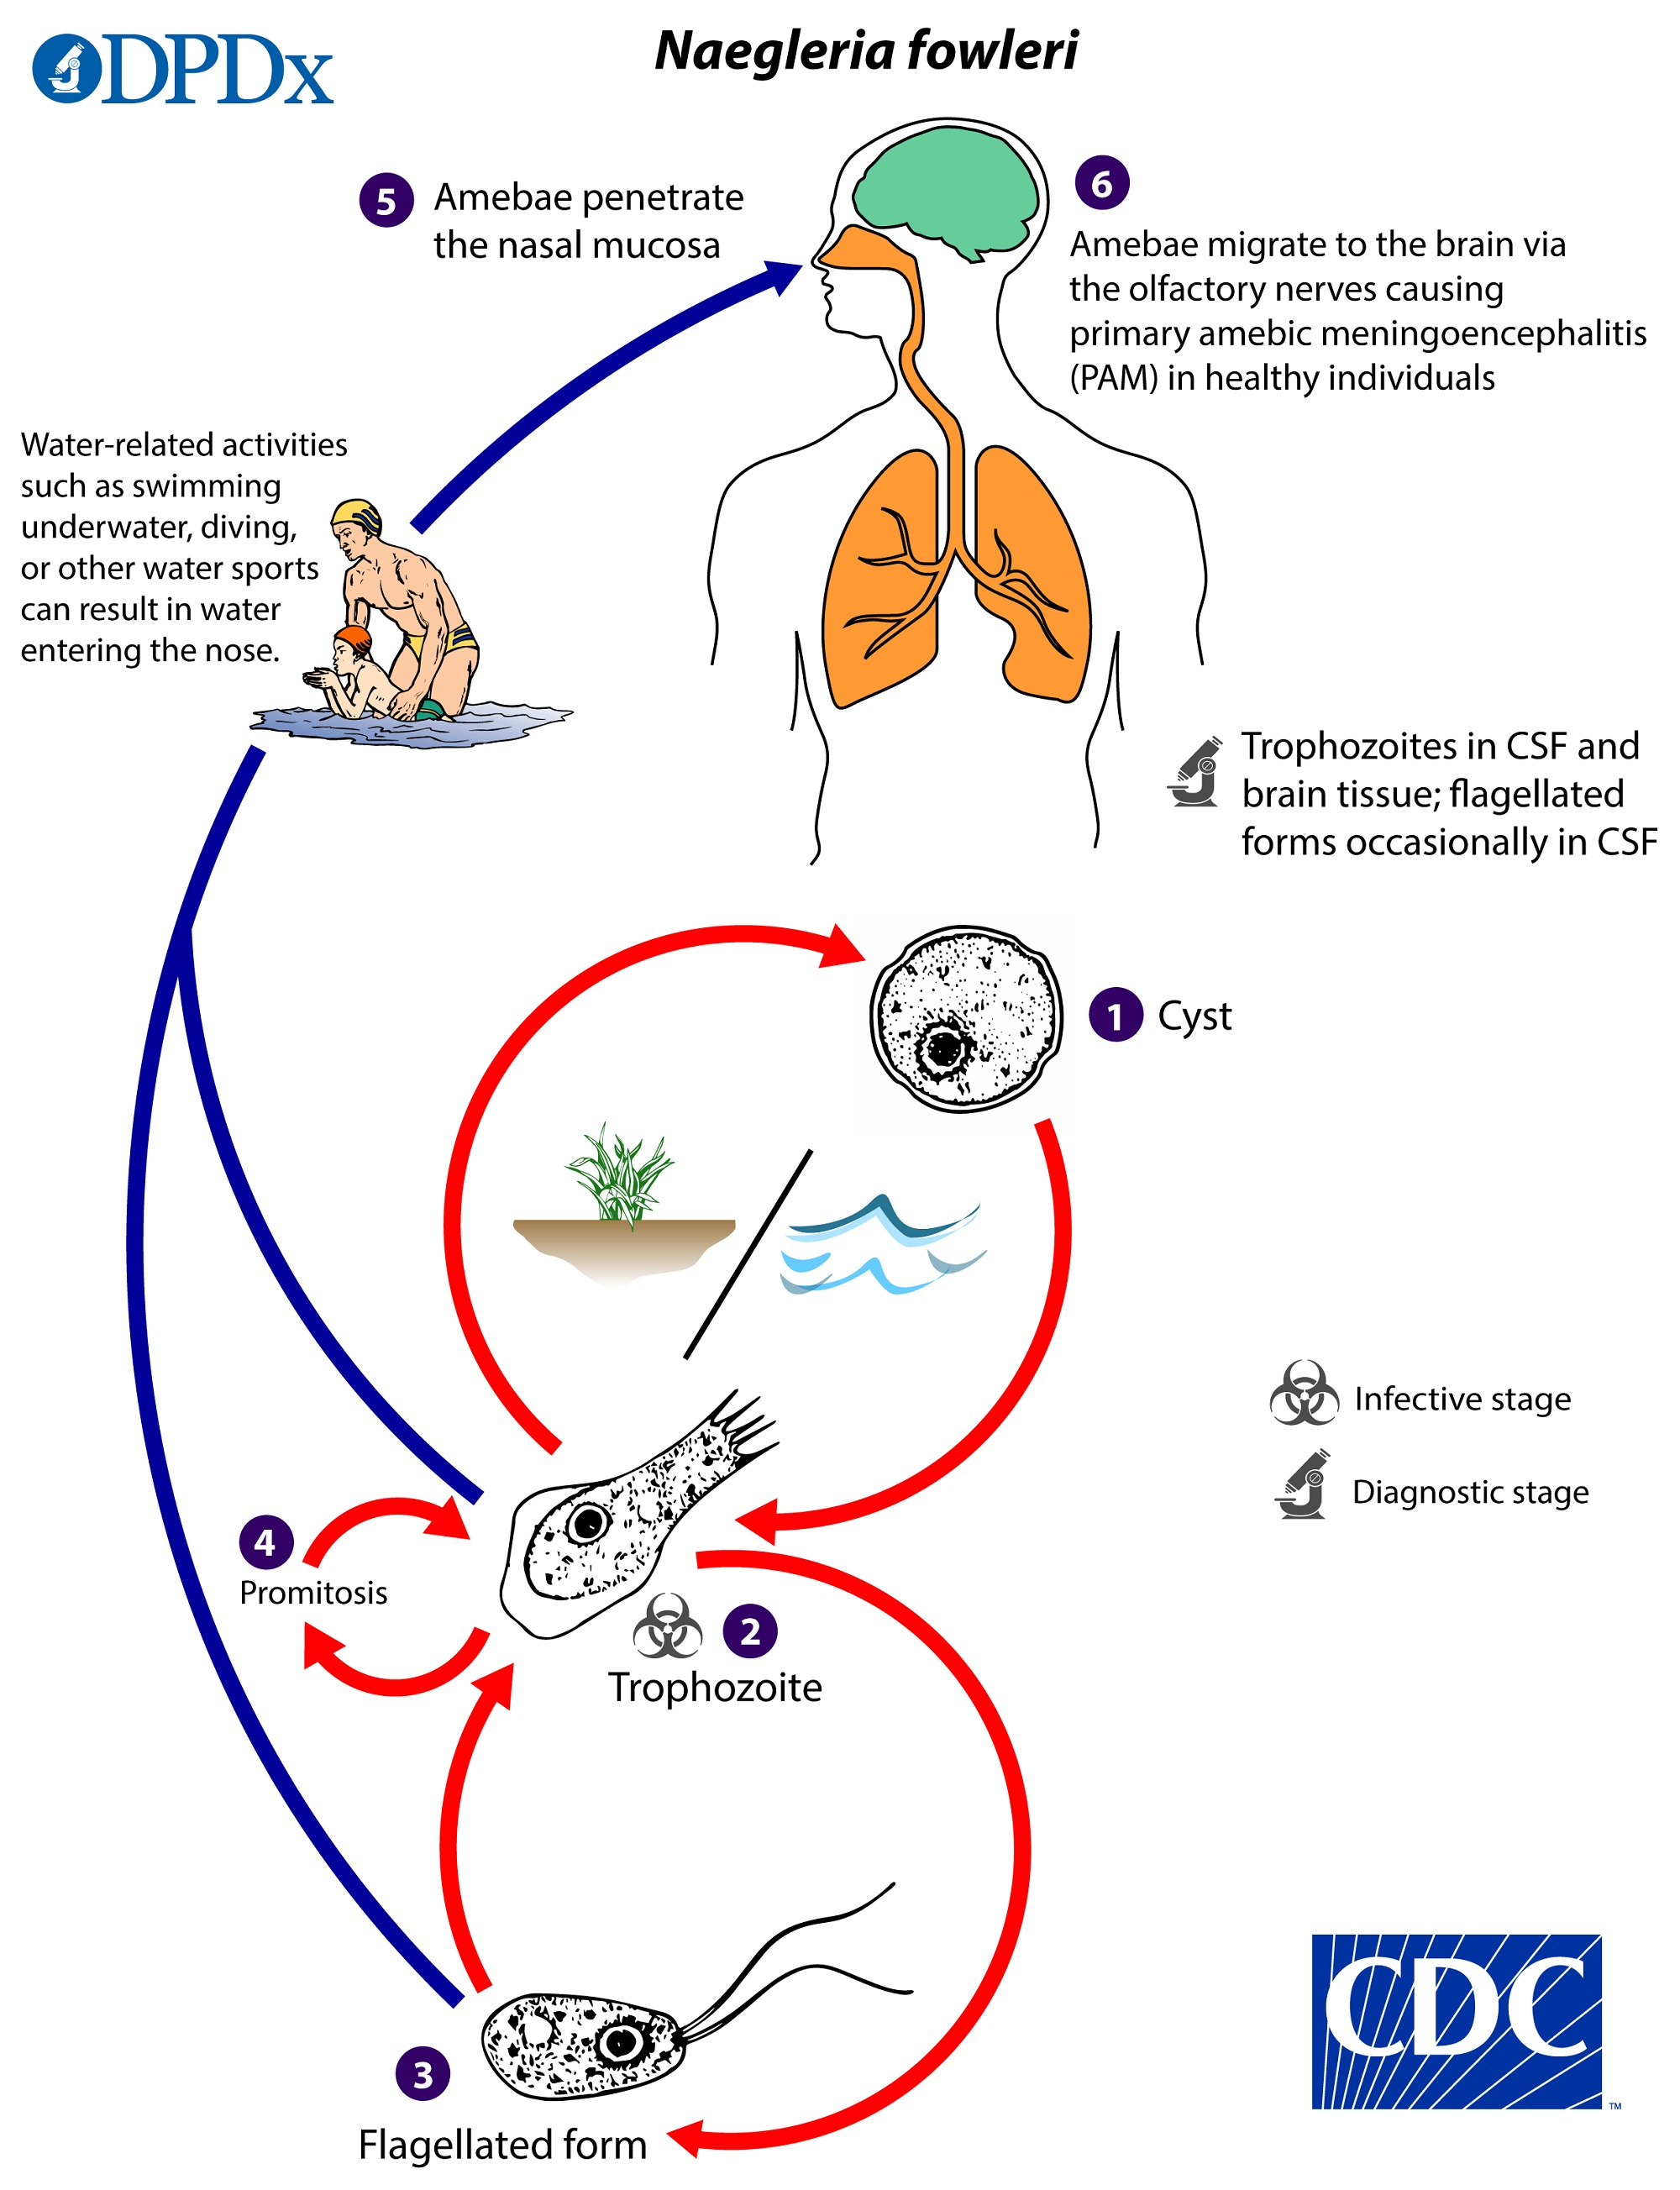 Naegleria fowleri ciclo